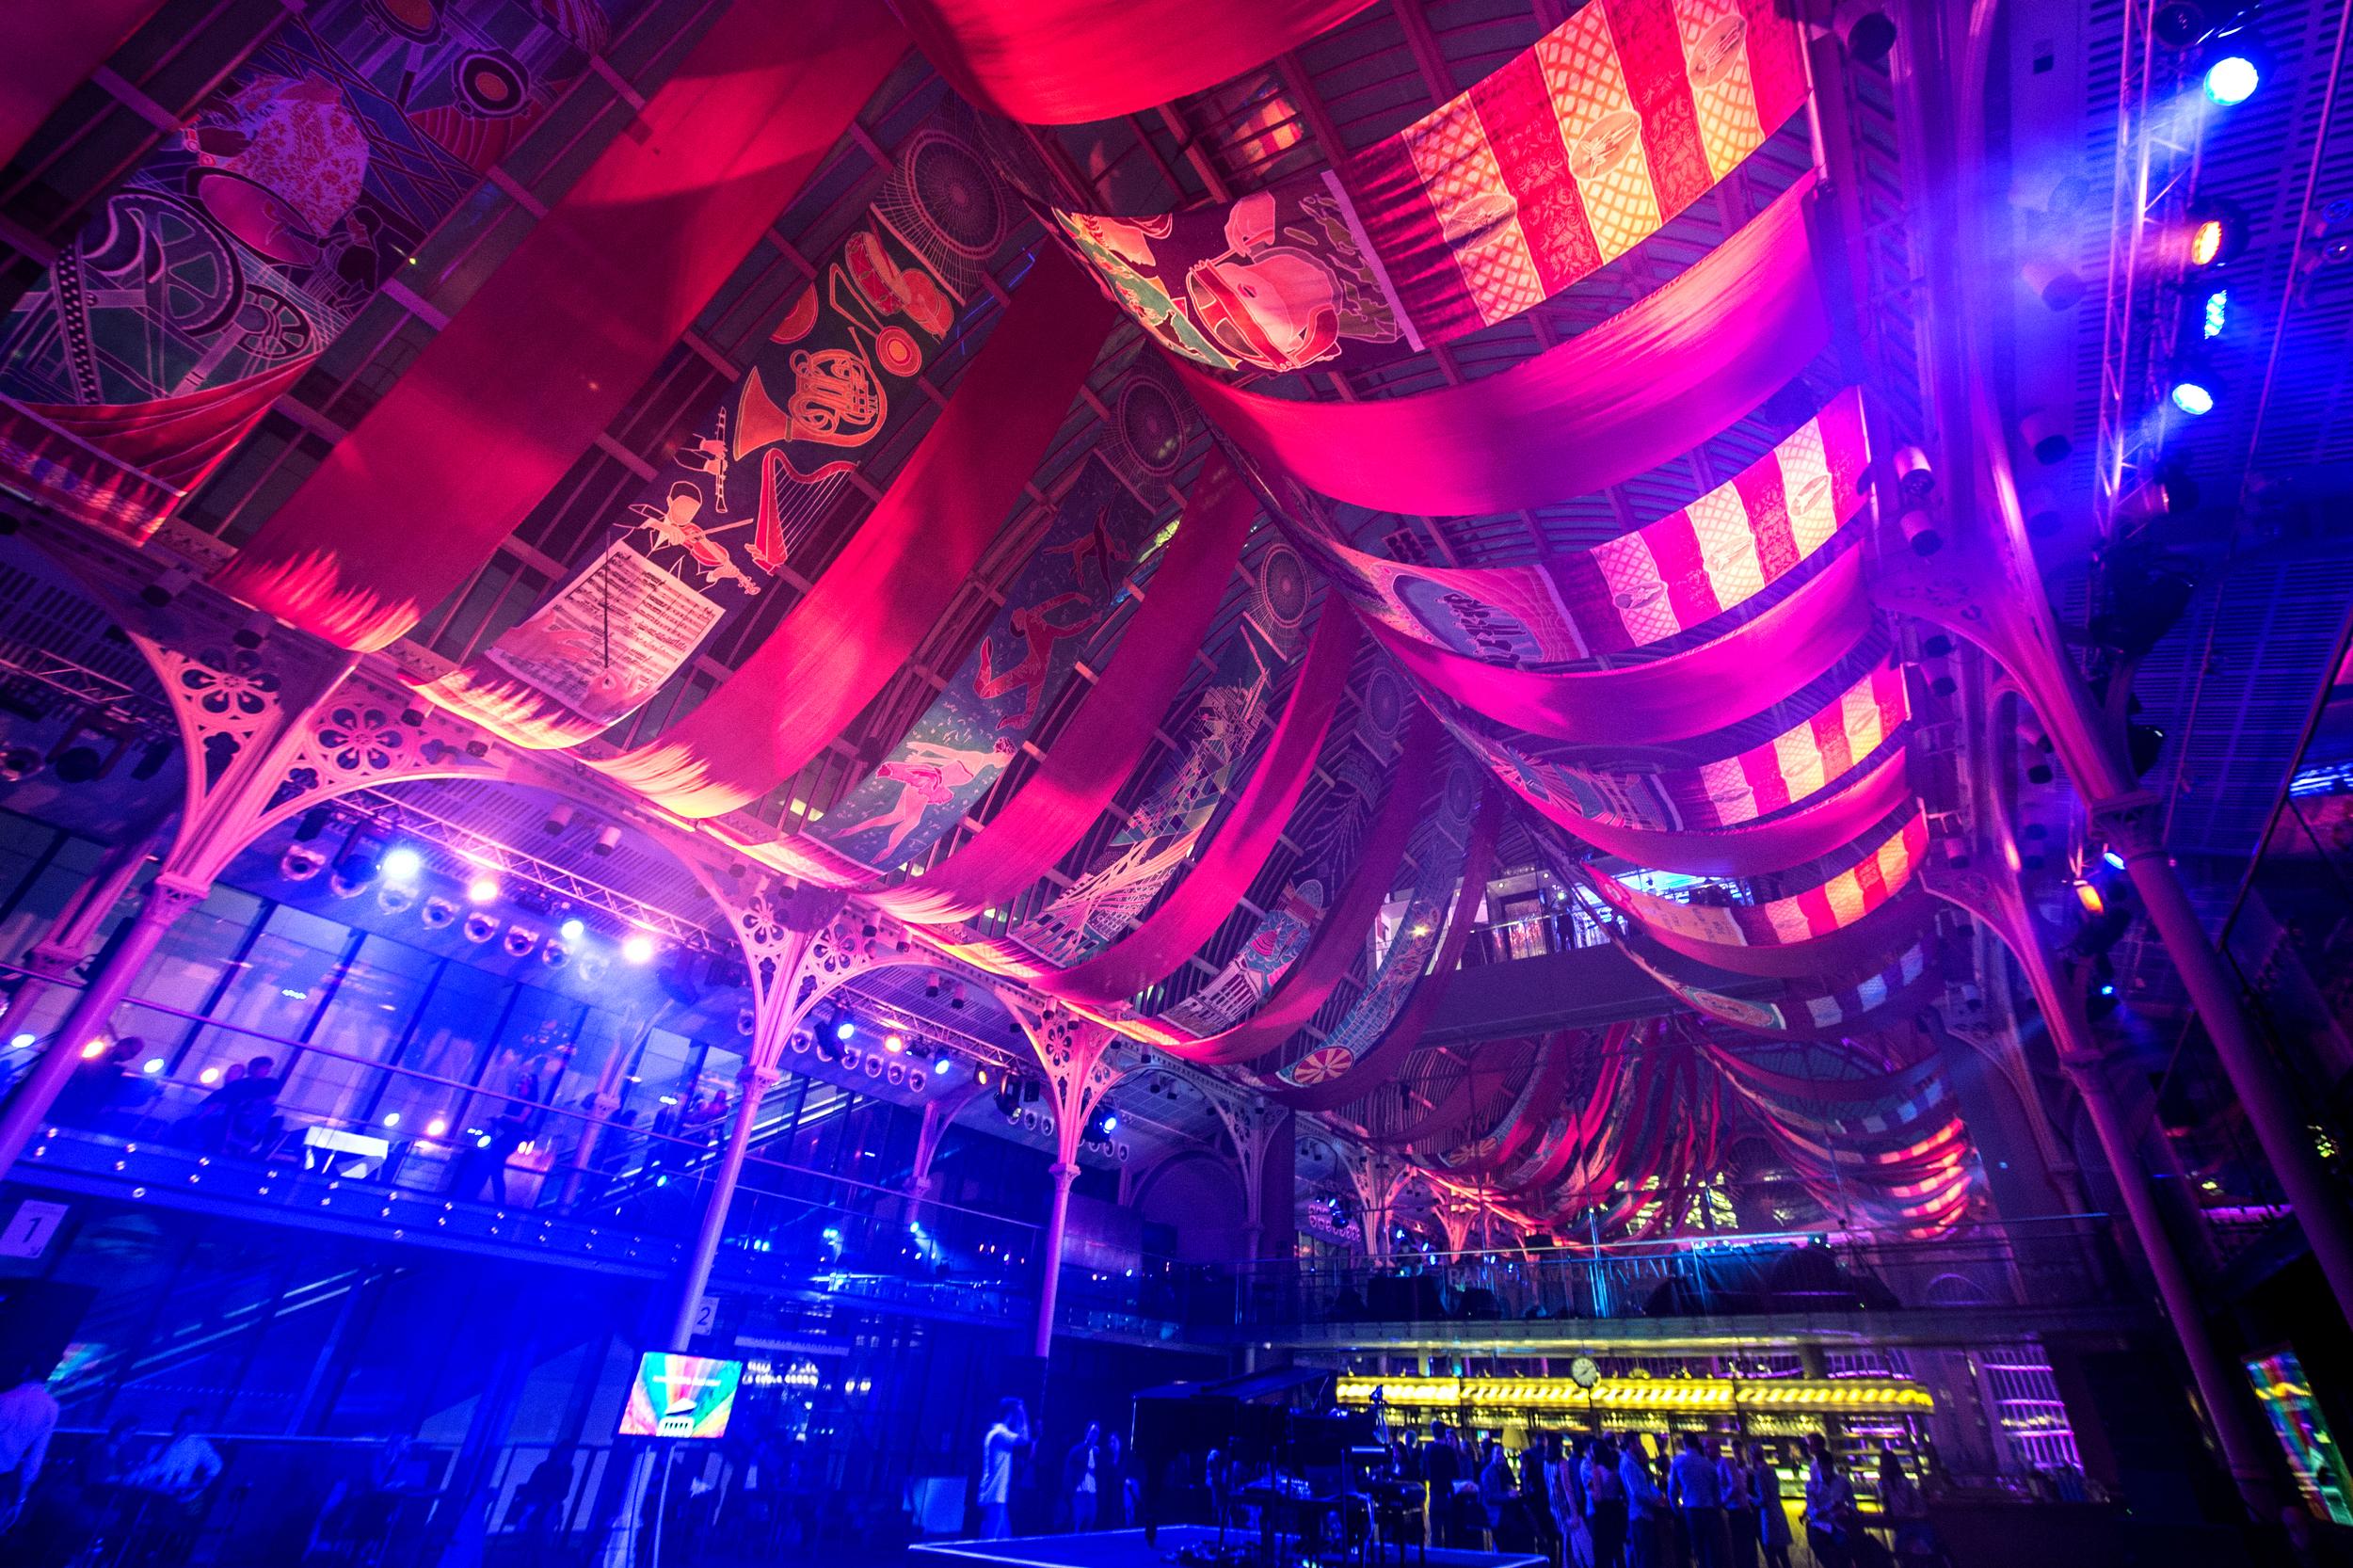 ROH-Kinetika-Deloitte-Ignite-2015-179 Nonclassical Club Night - Banners.jpg